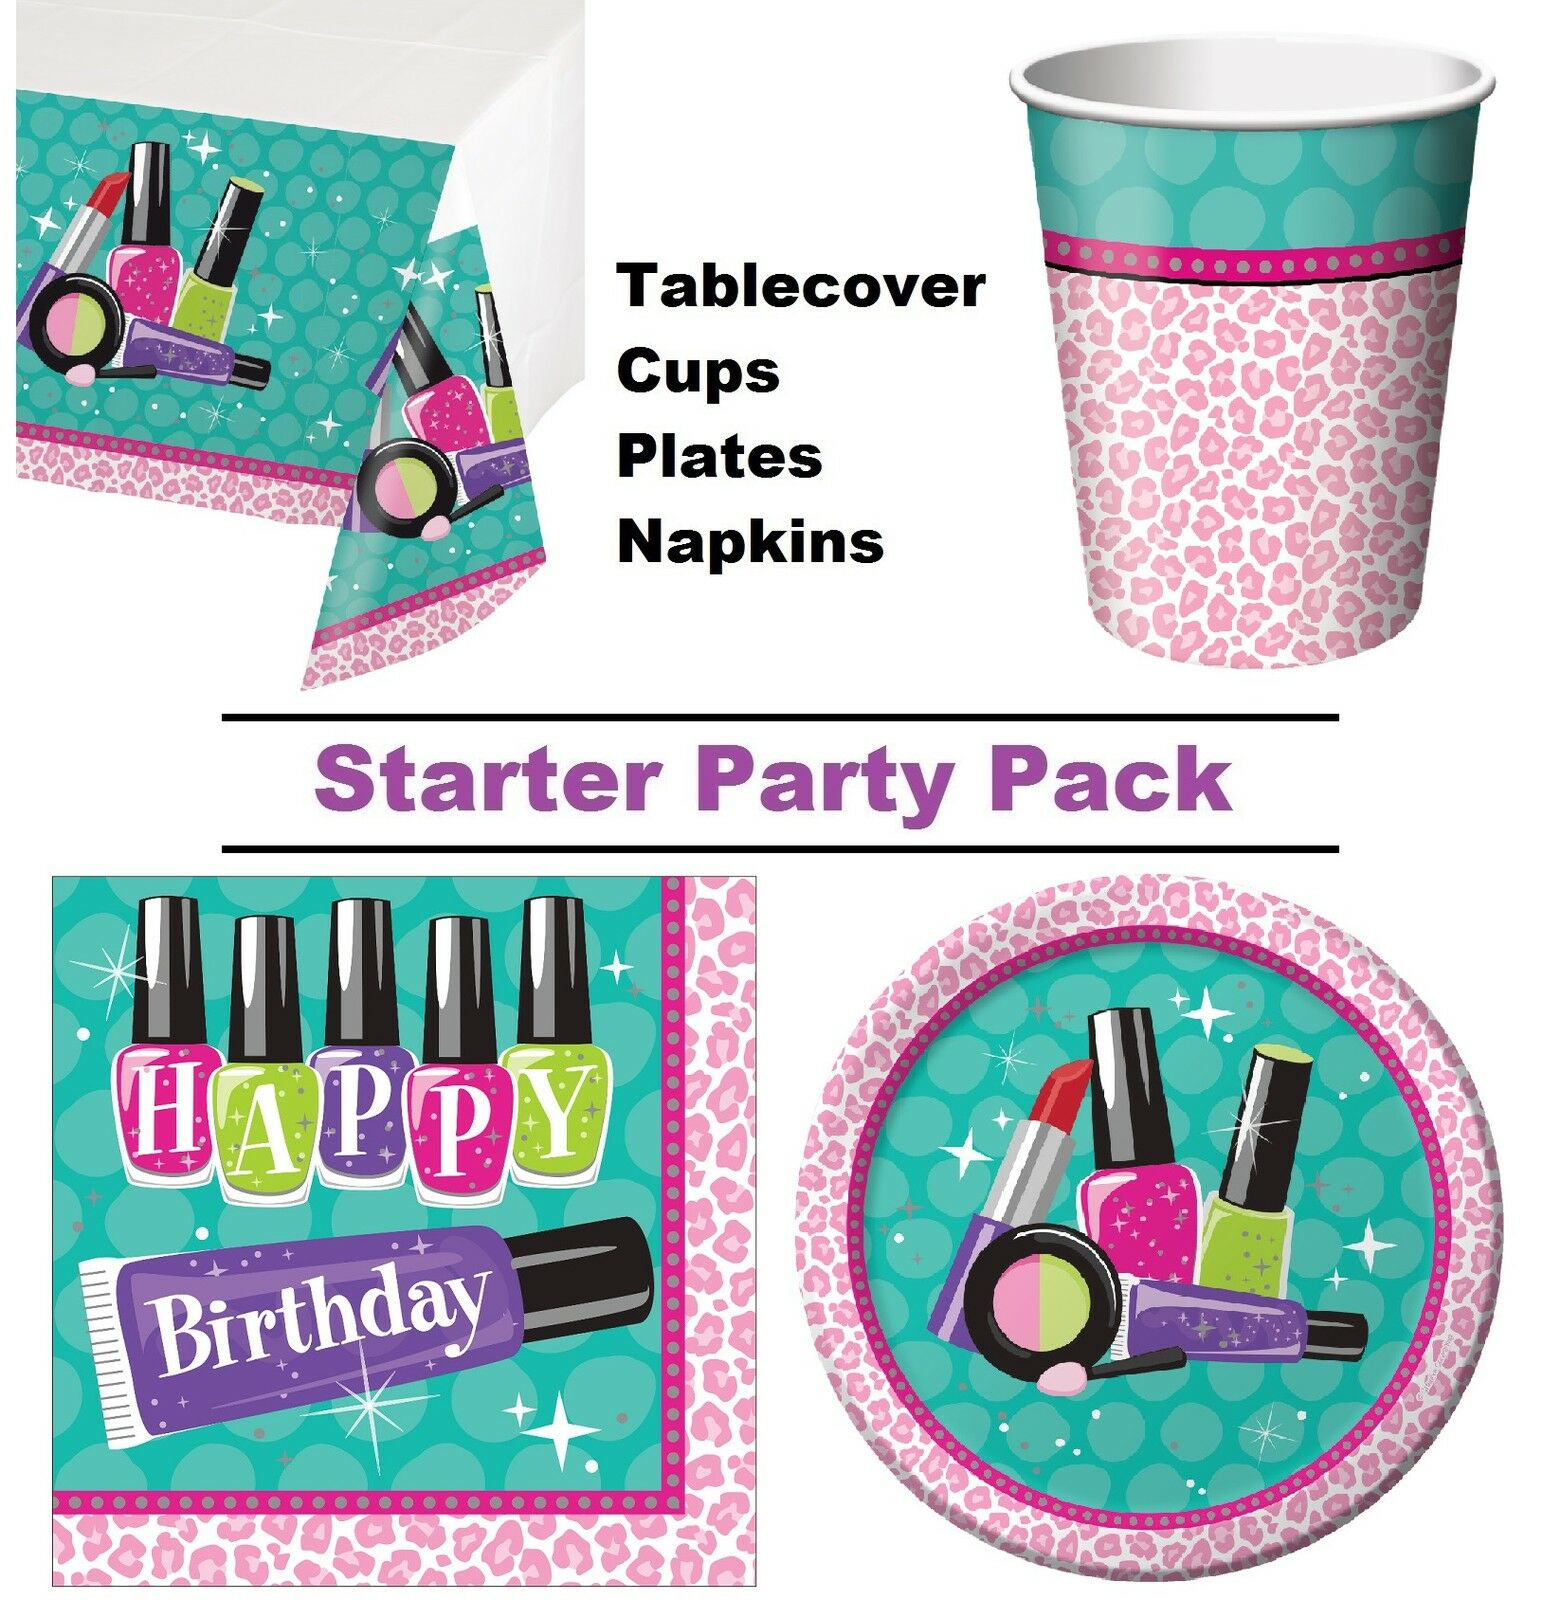 Funkeln Spa Make-Up 8-48 Gäste Party Starterpaket - Teller Becher Servietten